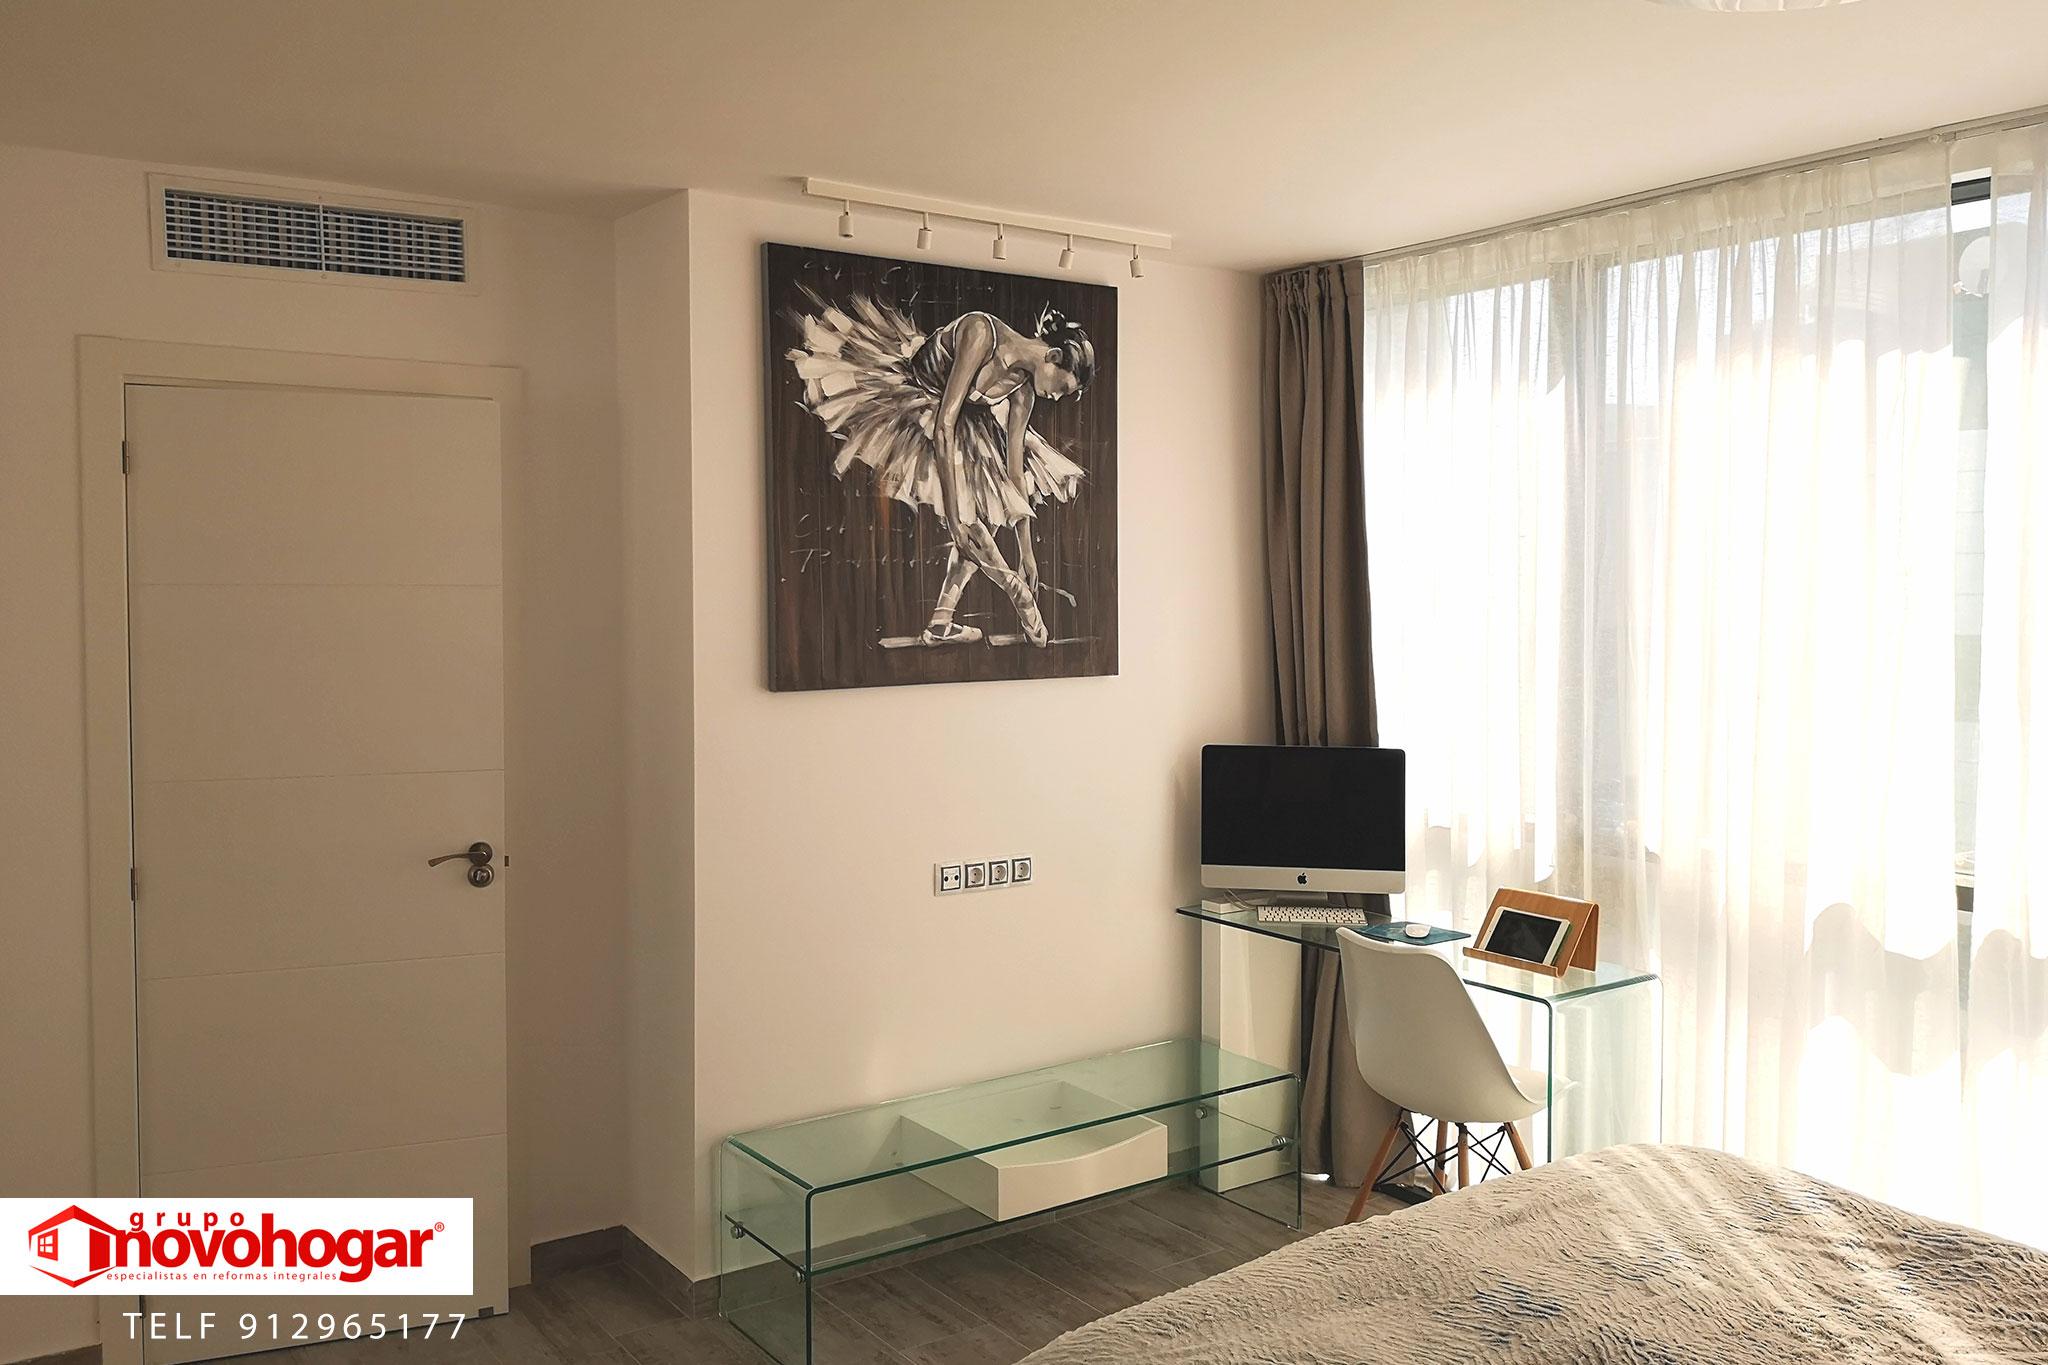 imagenes de pisos